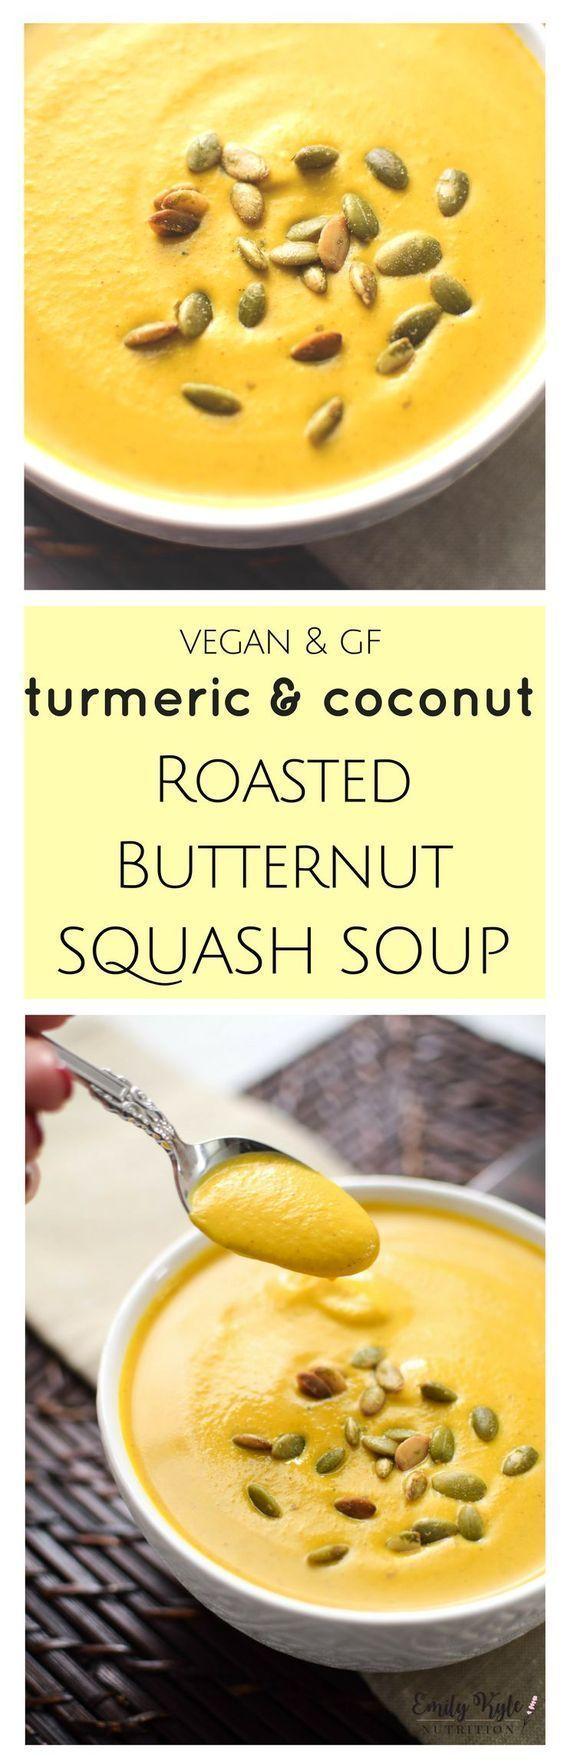 Turmeric Coconut Roasted Butternut Squash Bisque